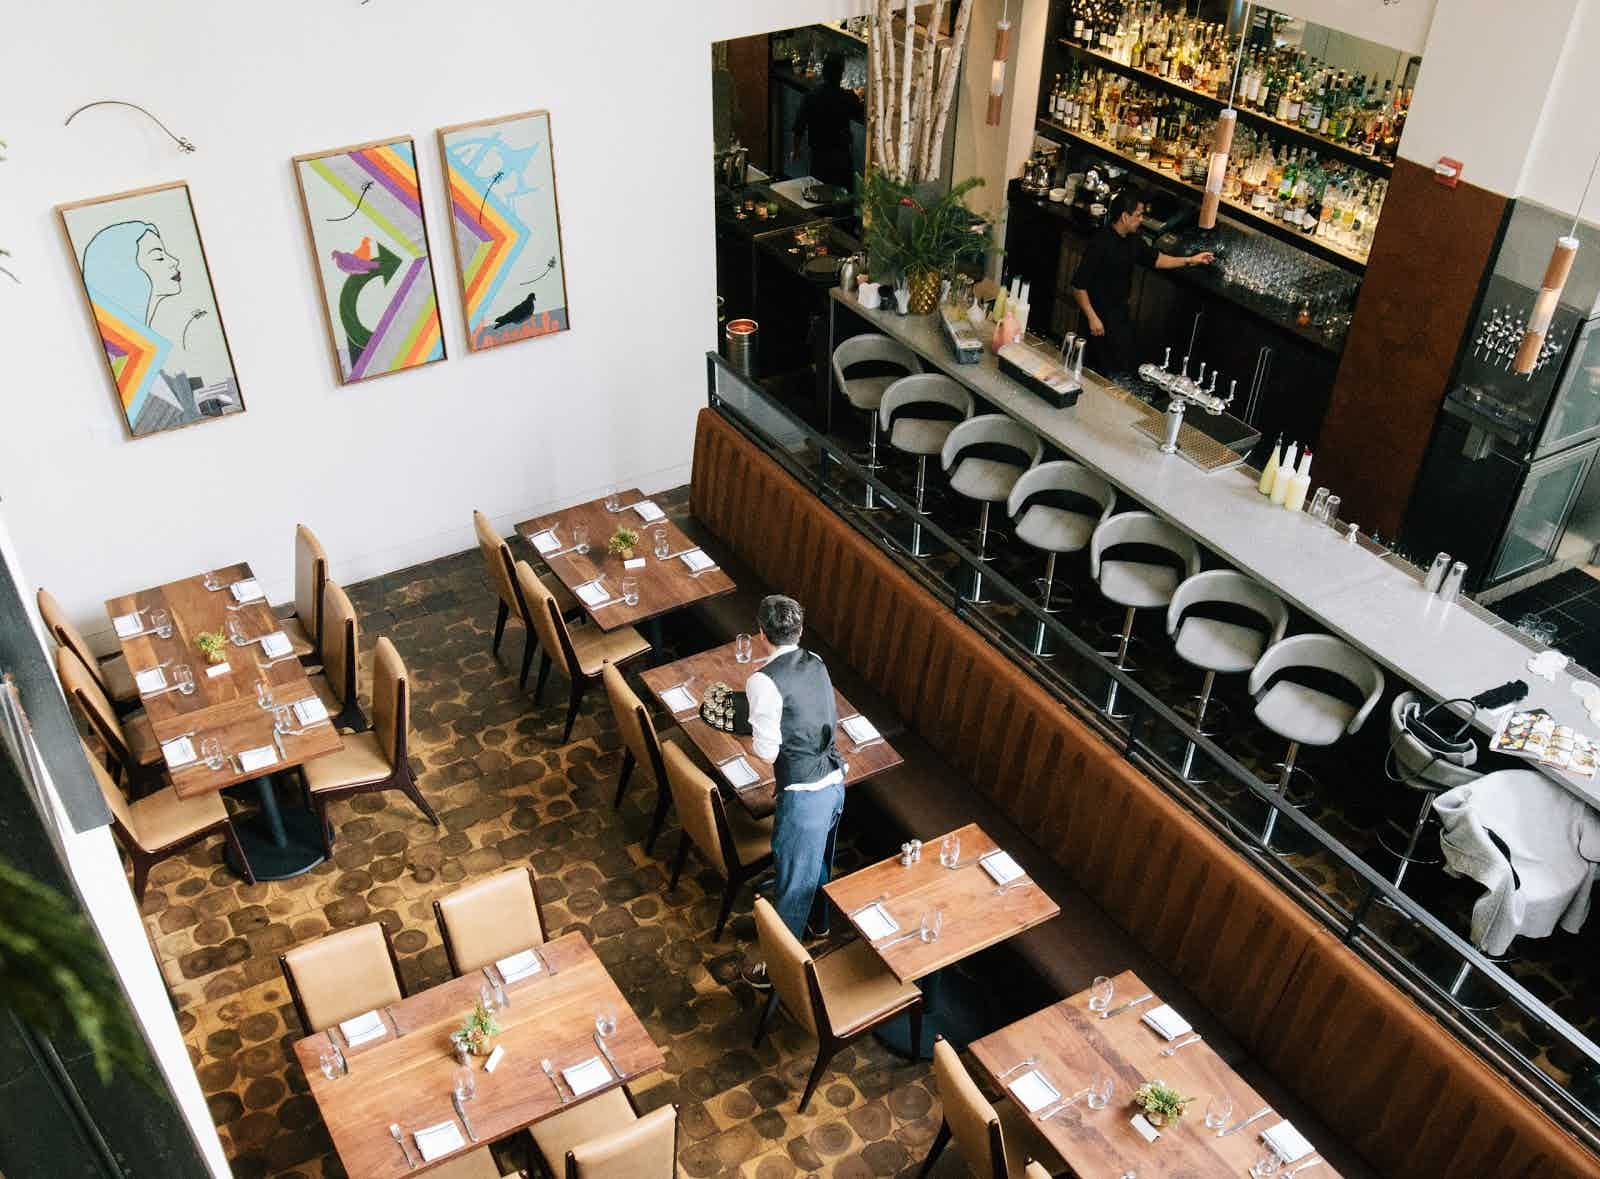 Best Restaurants Near Union Square Zagat